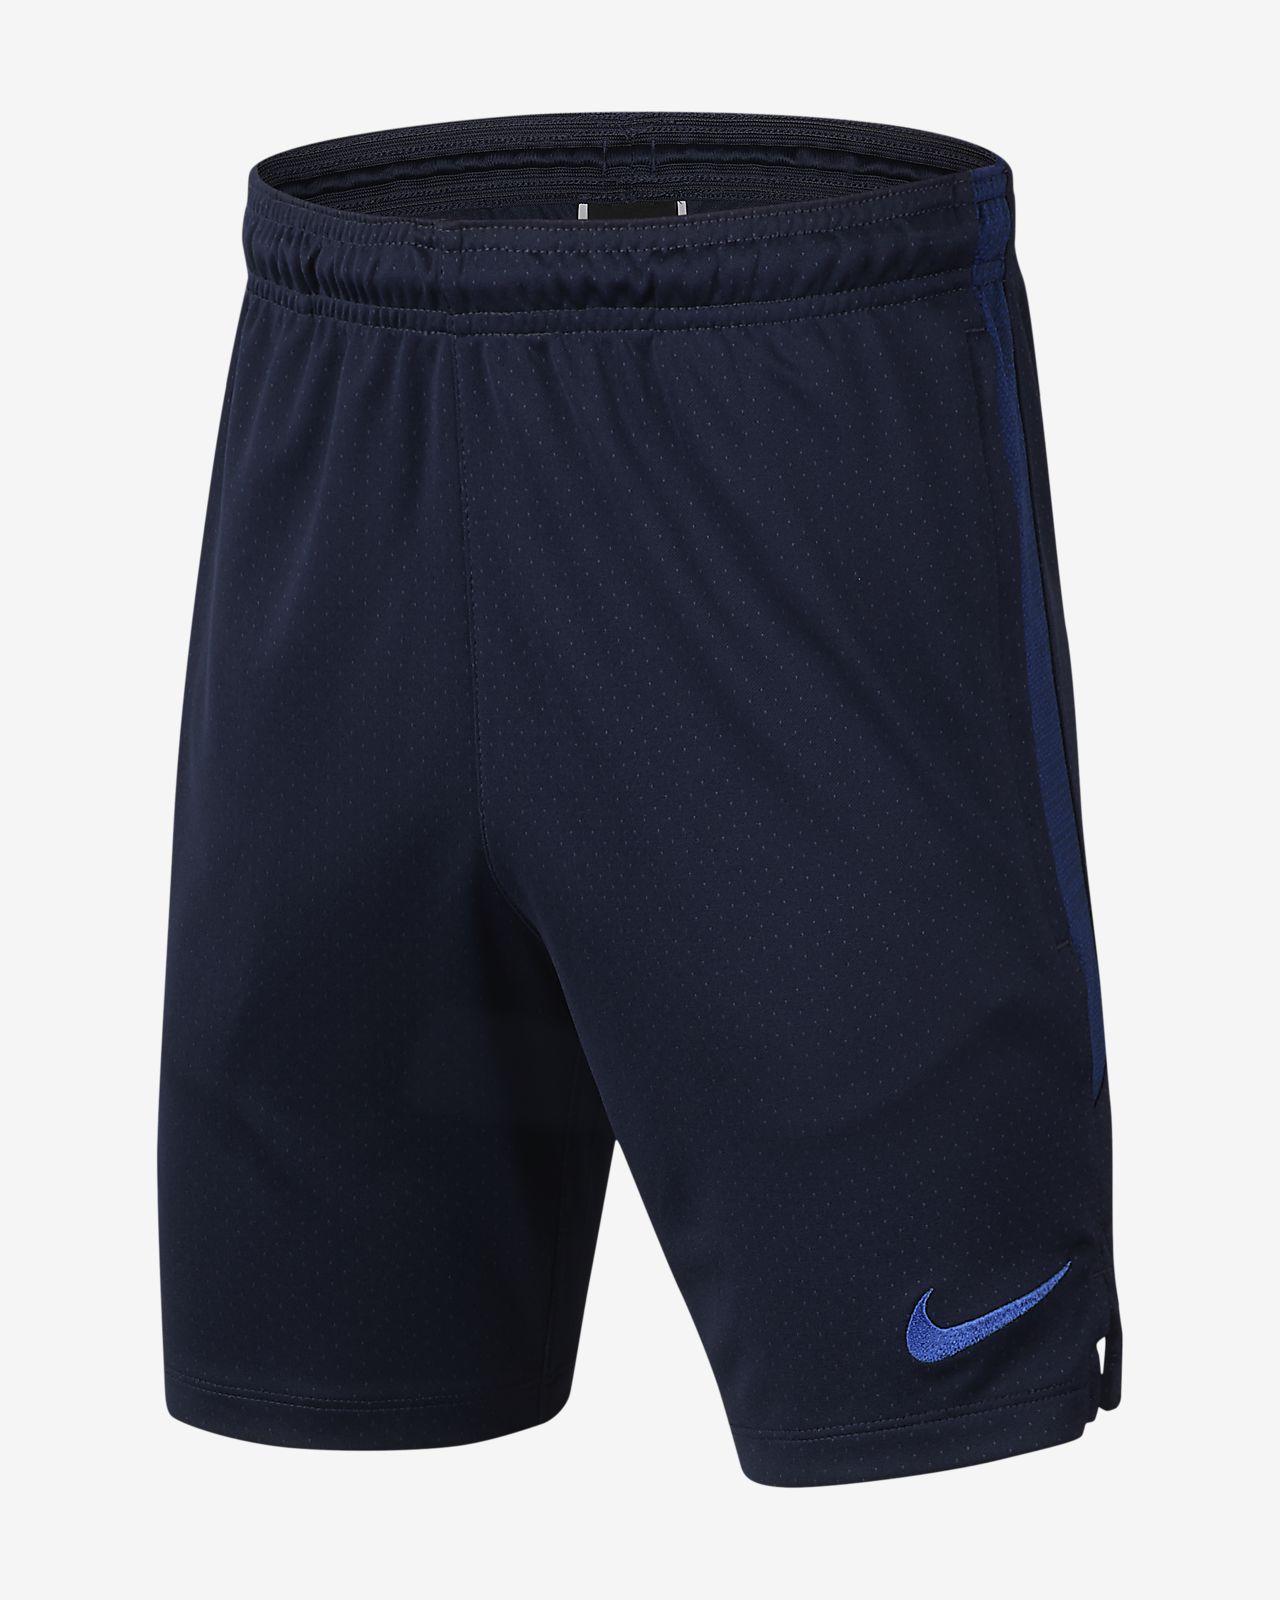 Shorts de fútbol para niños talla grande Nike Nike Dri-FIT Chelsea FC Strike